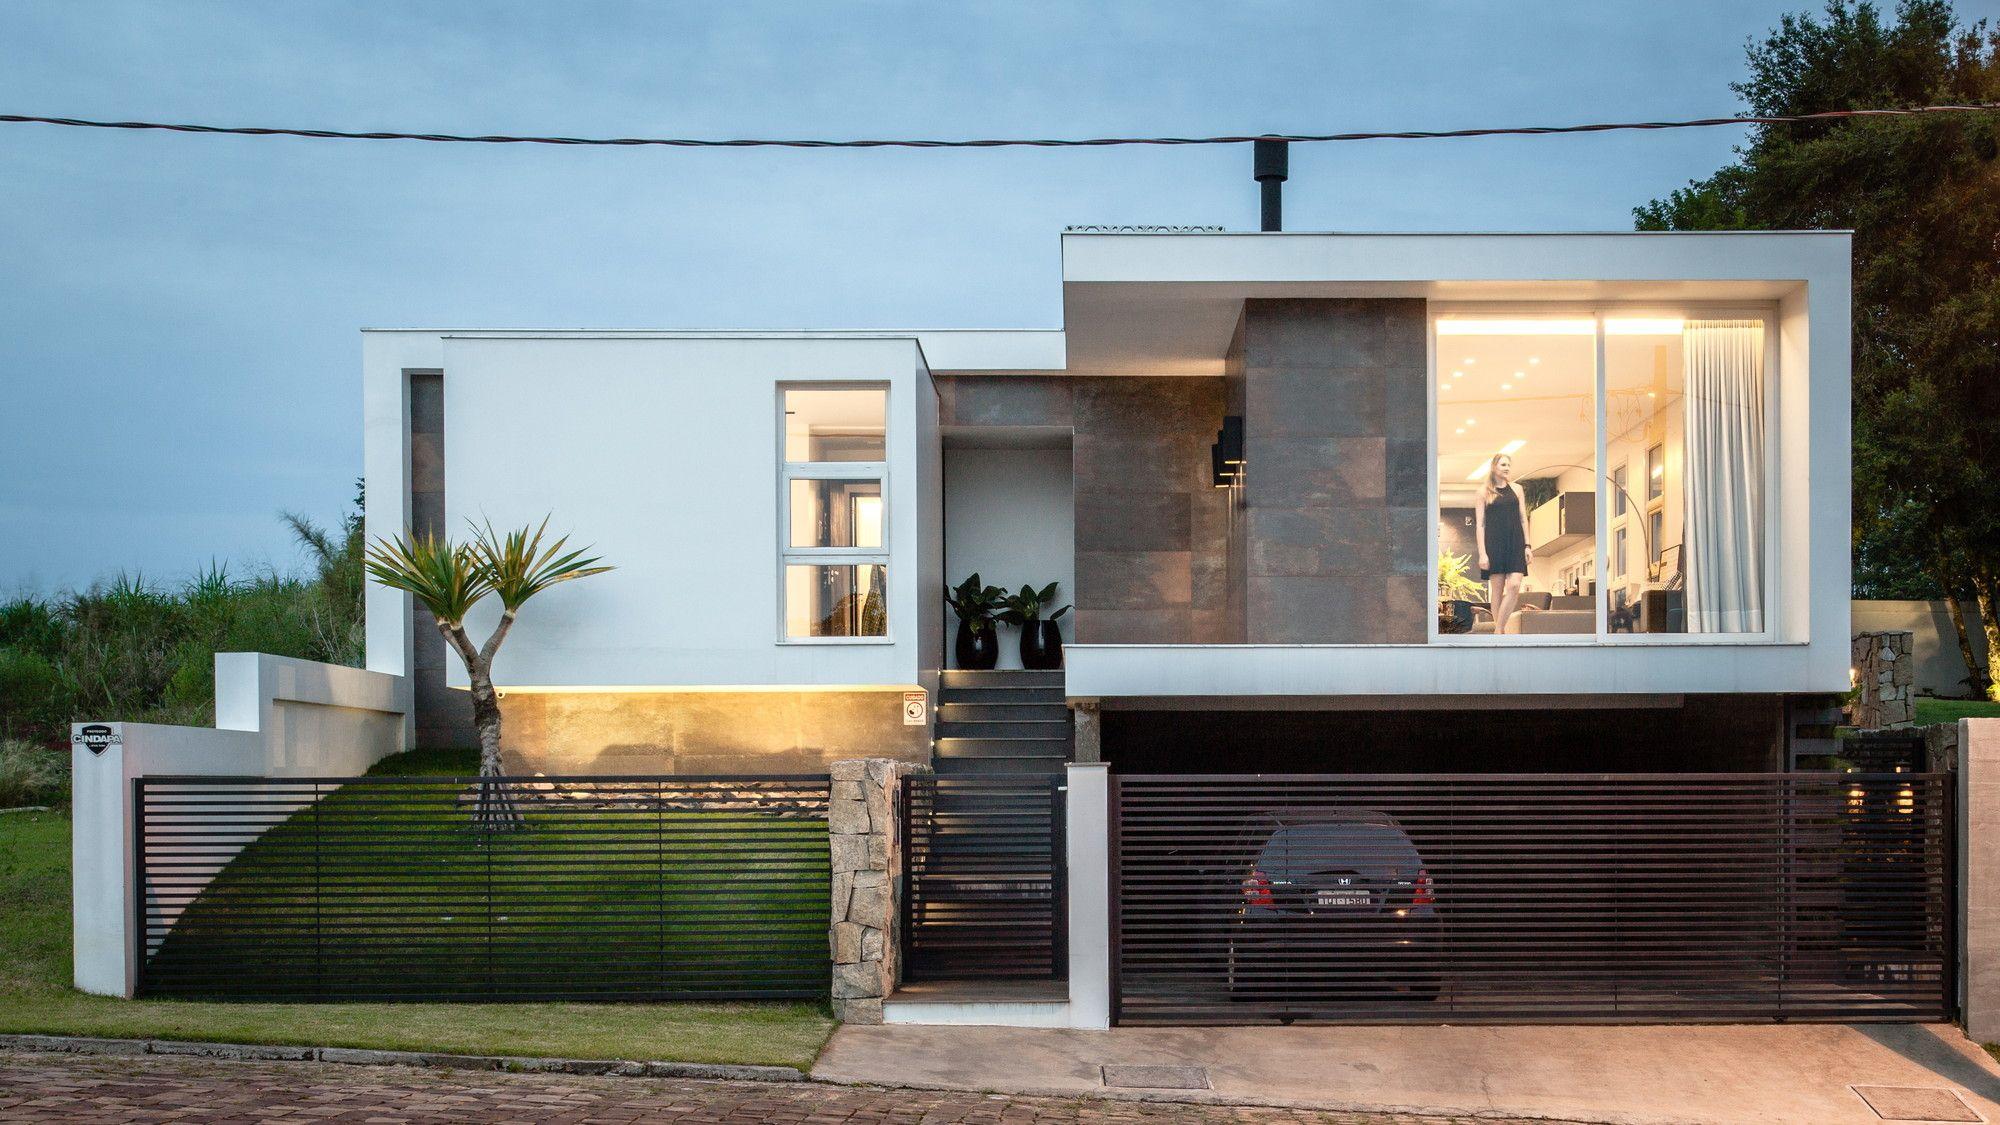 Casa id cadi arquitetura fachadas mic arquitetura for Decoracion de casas brasilenas